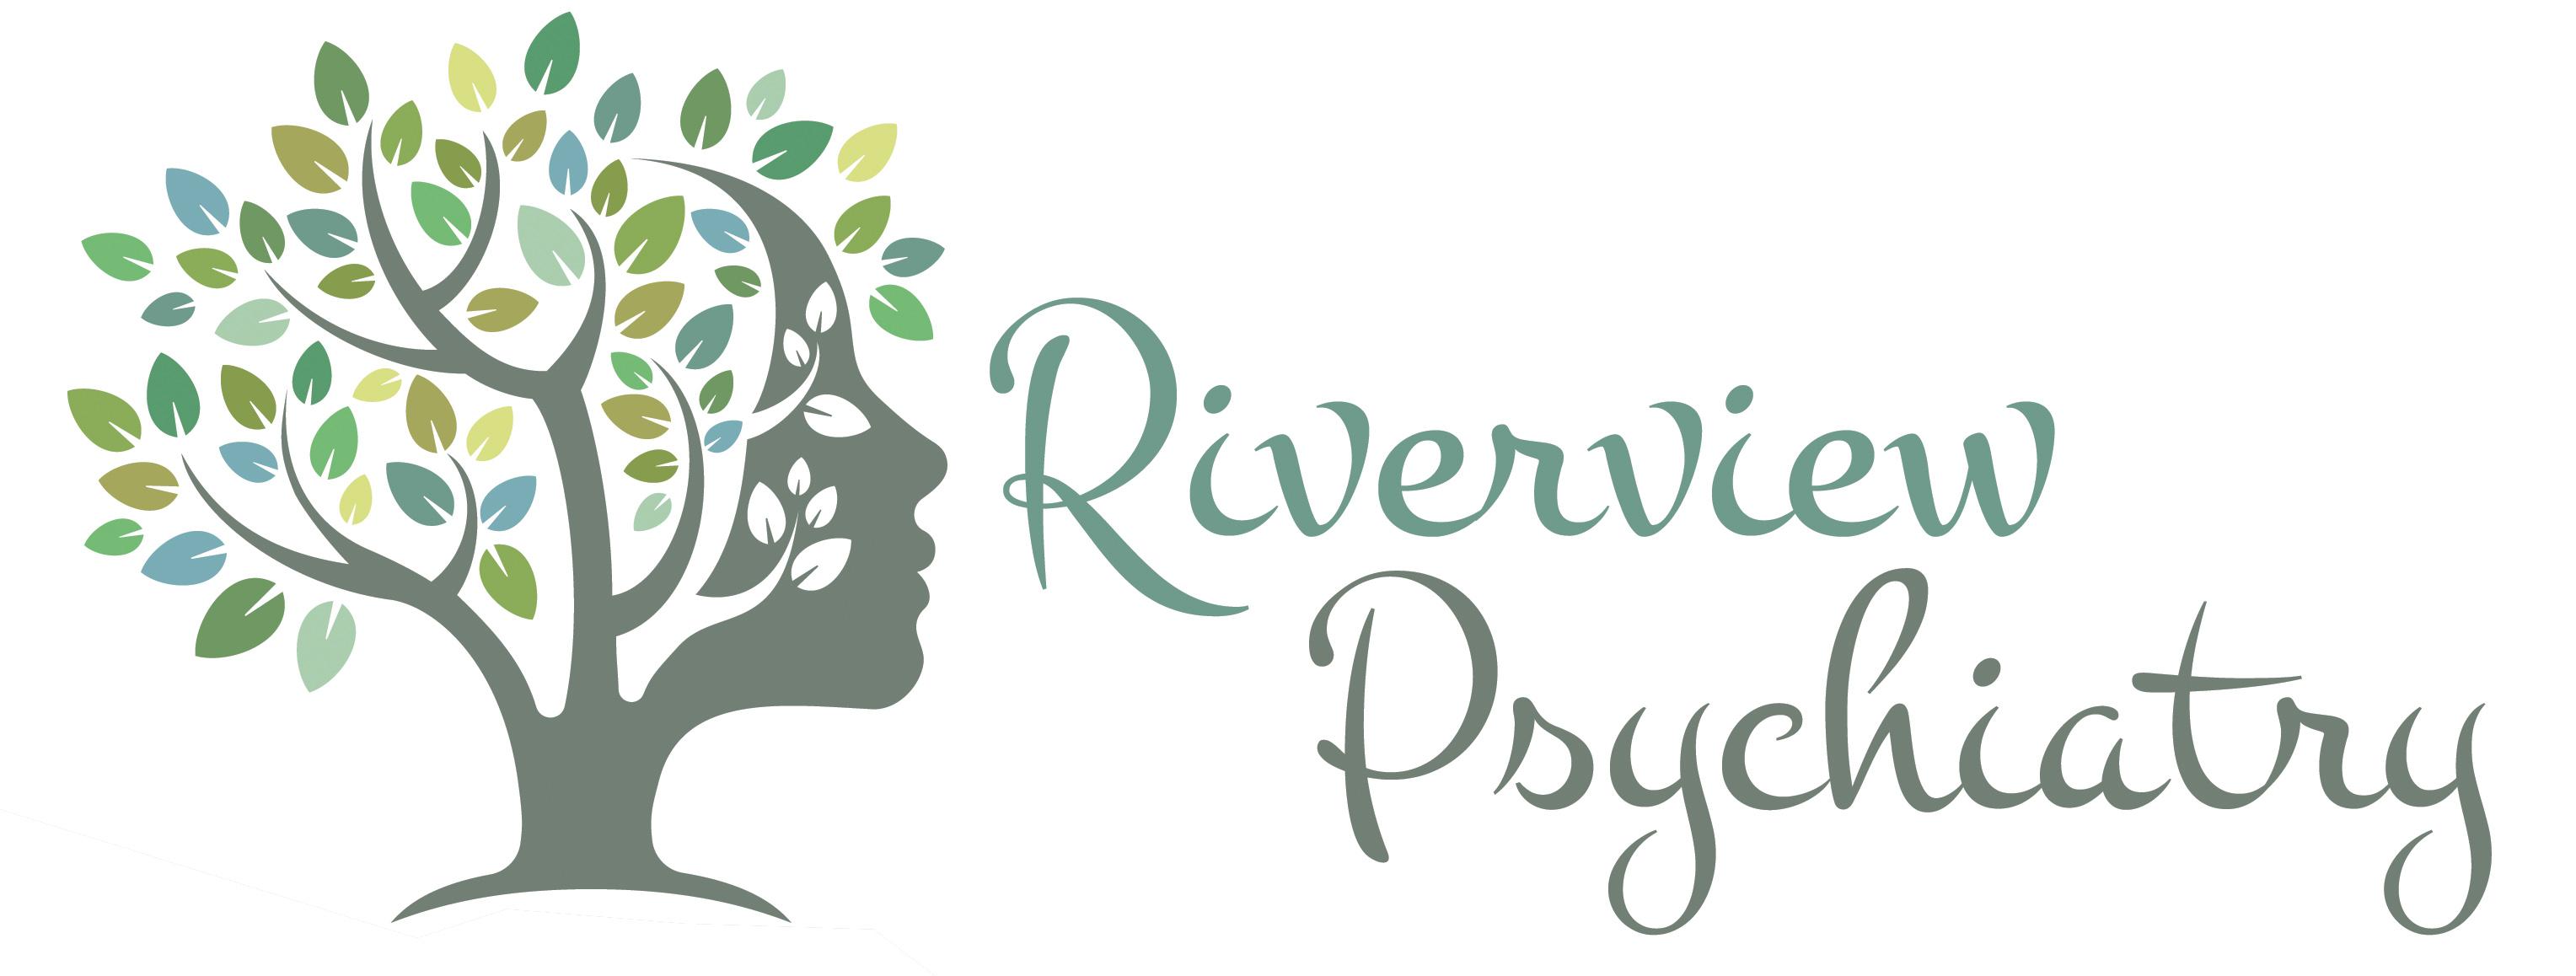 Riverview Psychiatry